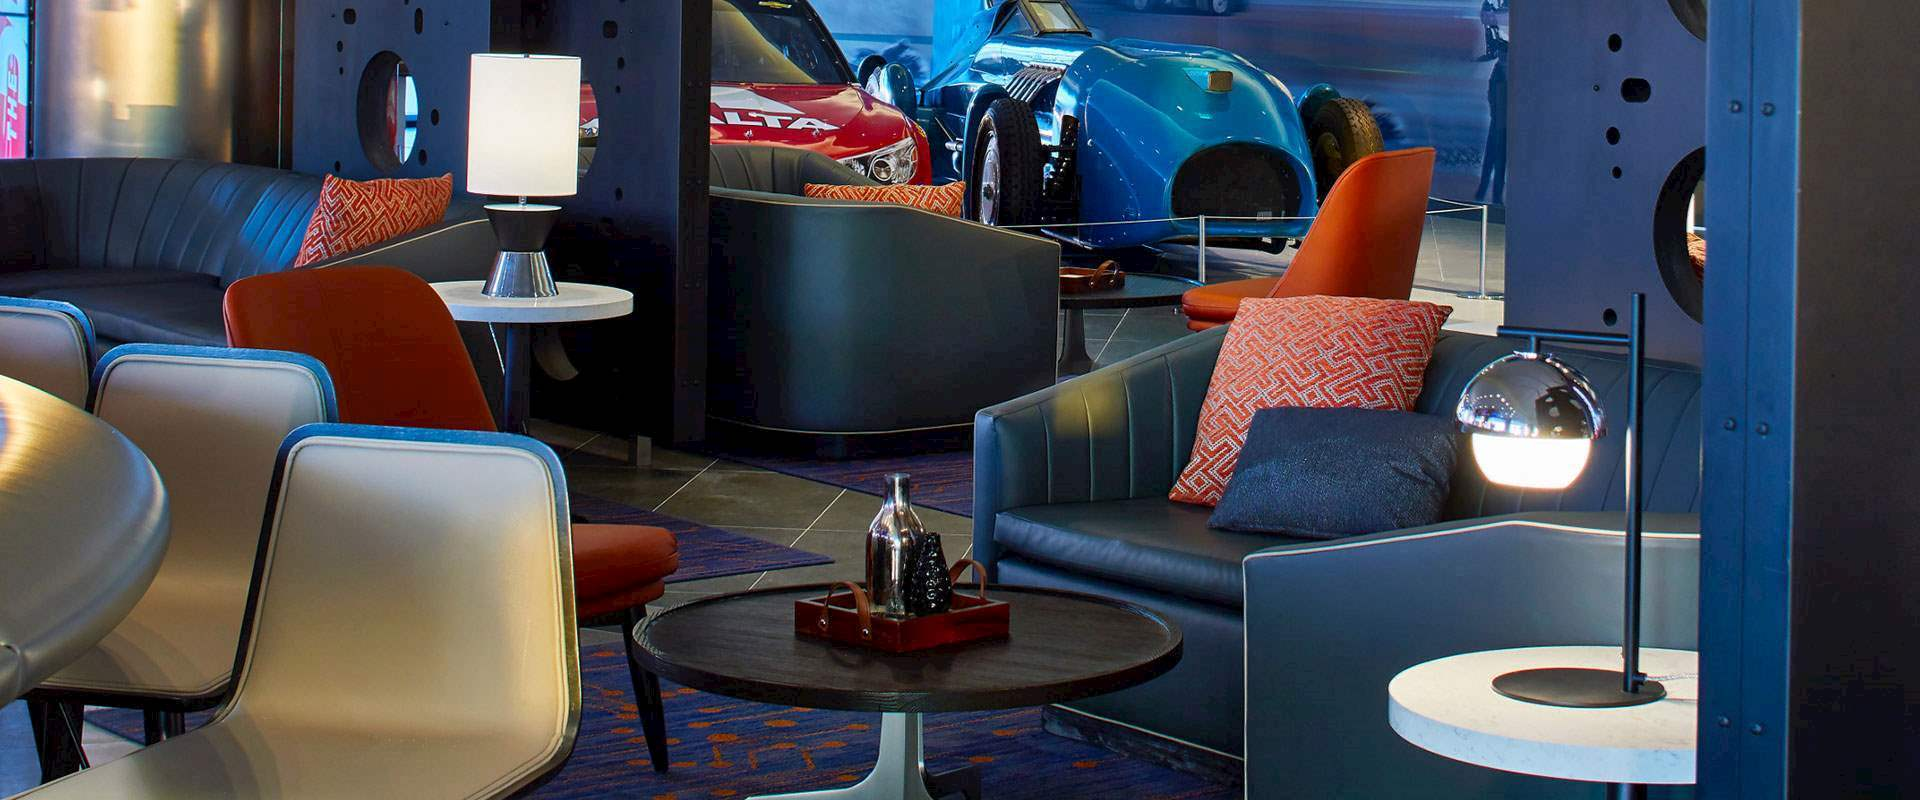 Blue Flame Bar at Daytona Beach Hotel